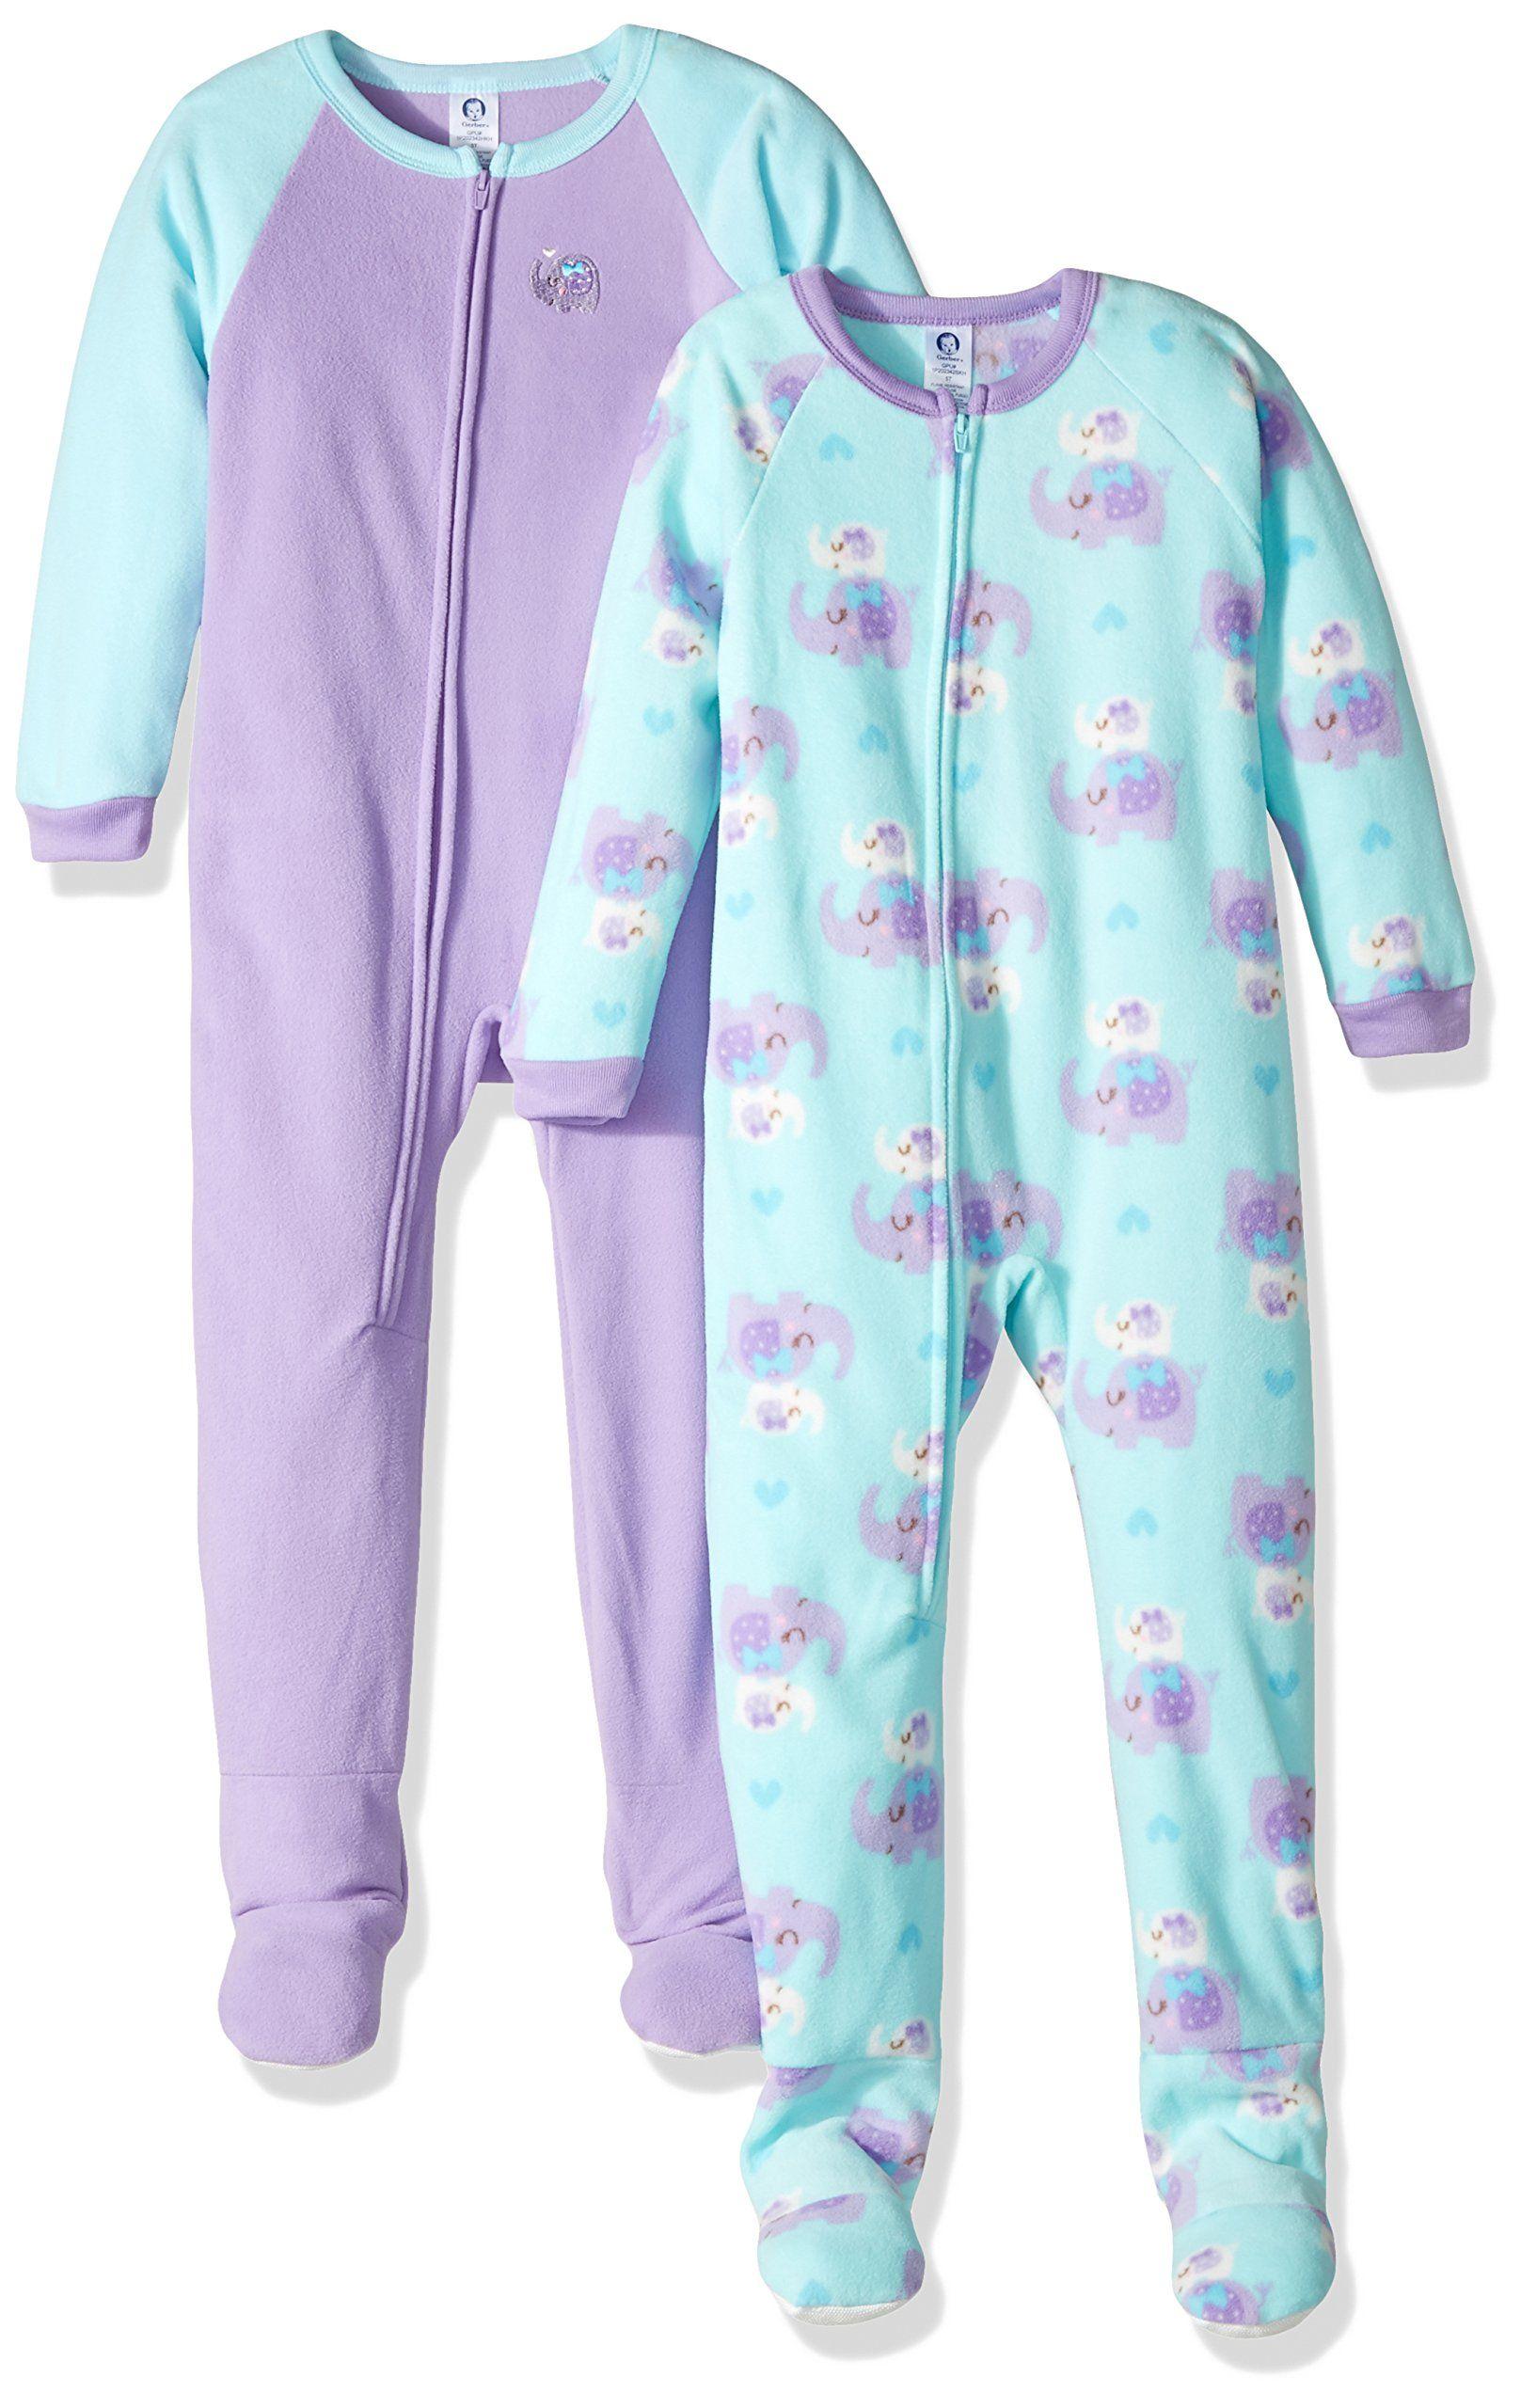 befbf278c Gerber Toddler Girls 2 Pack Blanket Sleeper